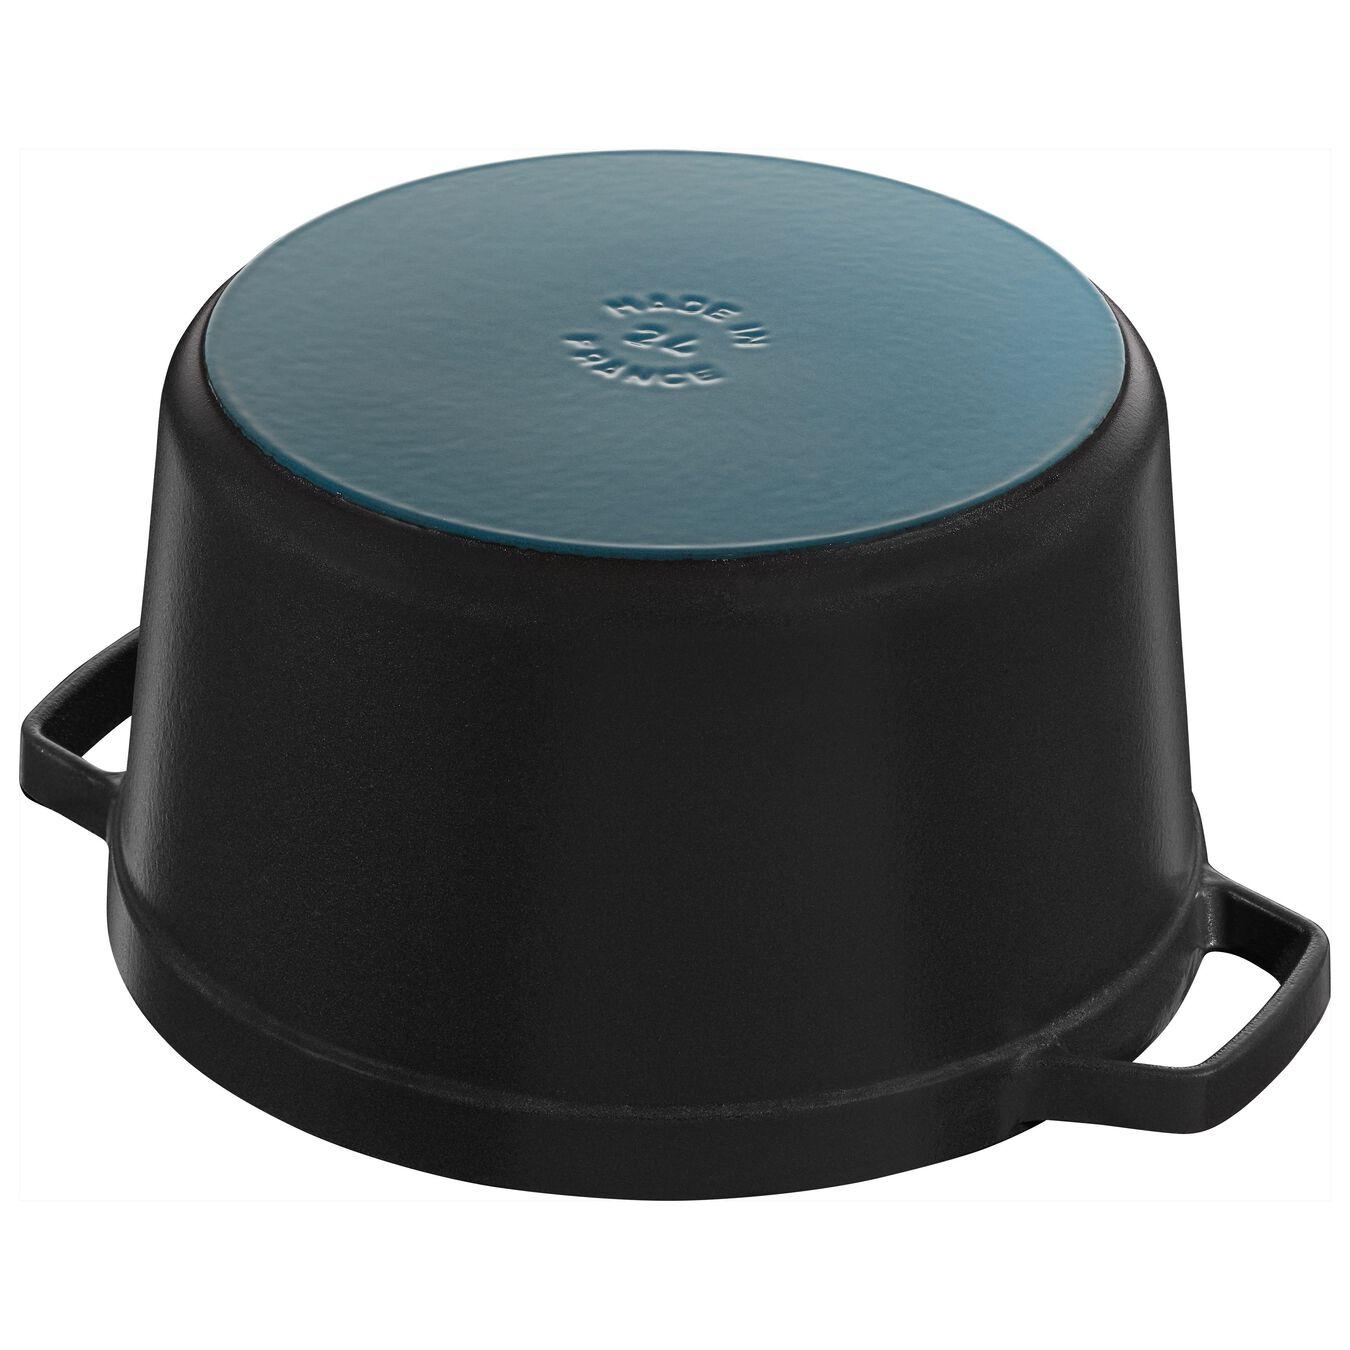 5 qt, round, Tall Cocotte, black matte,,large 4